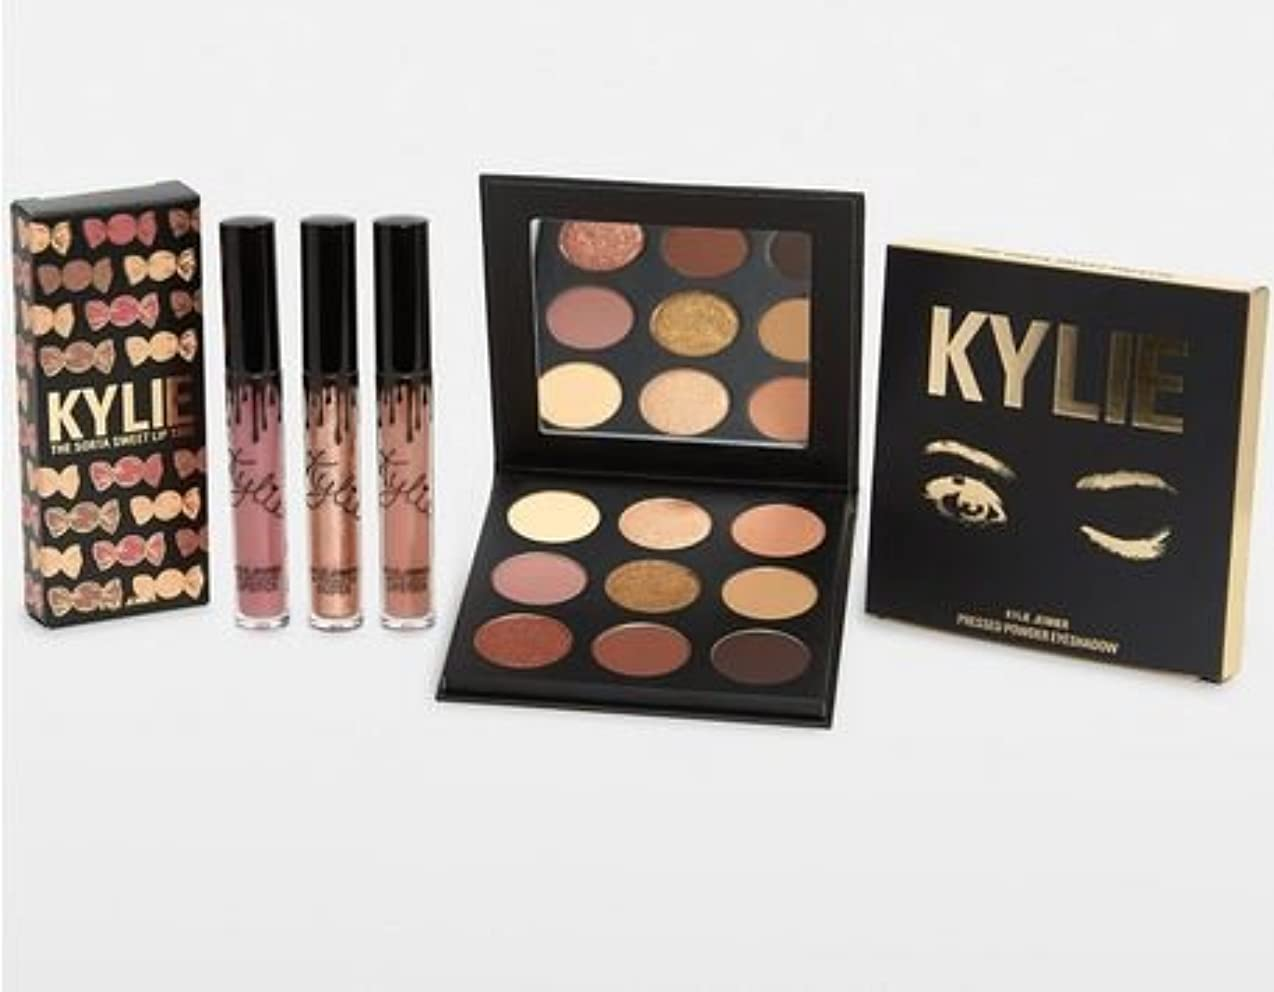 Kylie Cosmetics The Sorta Sweet Bundle シャドウパレットとリップのセット